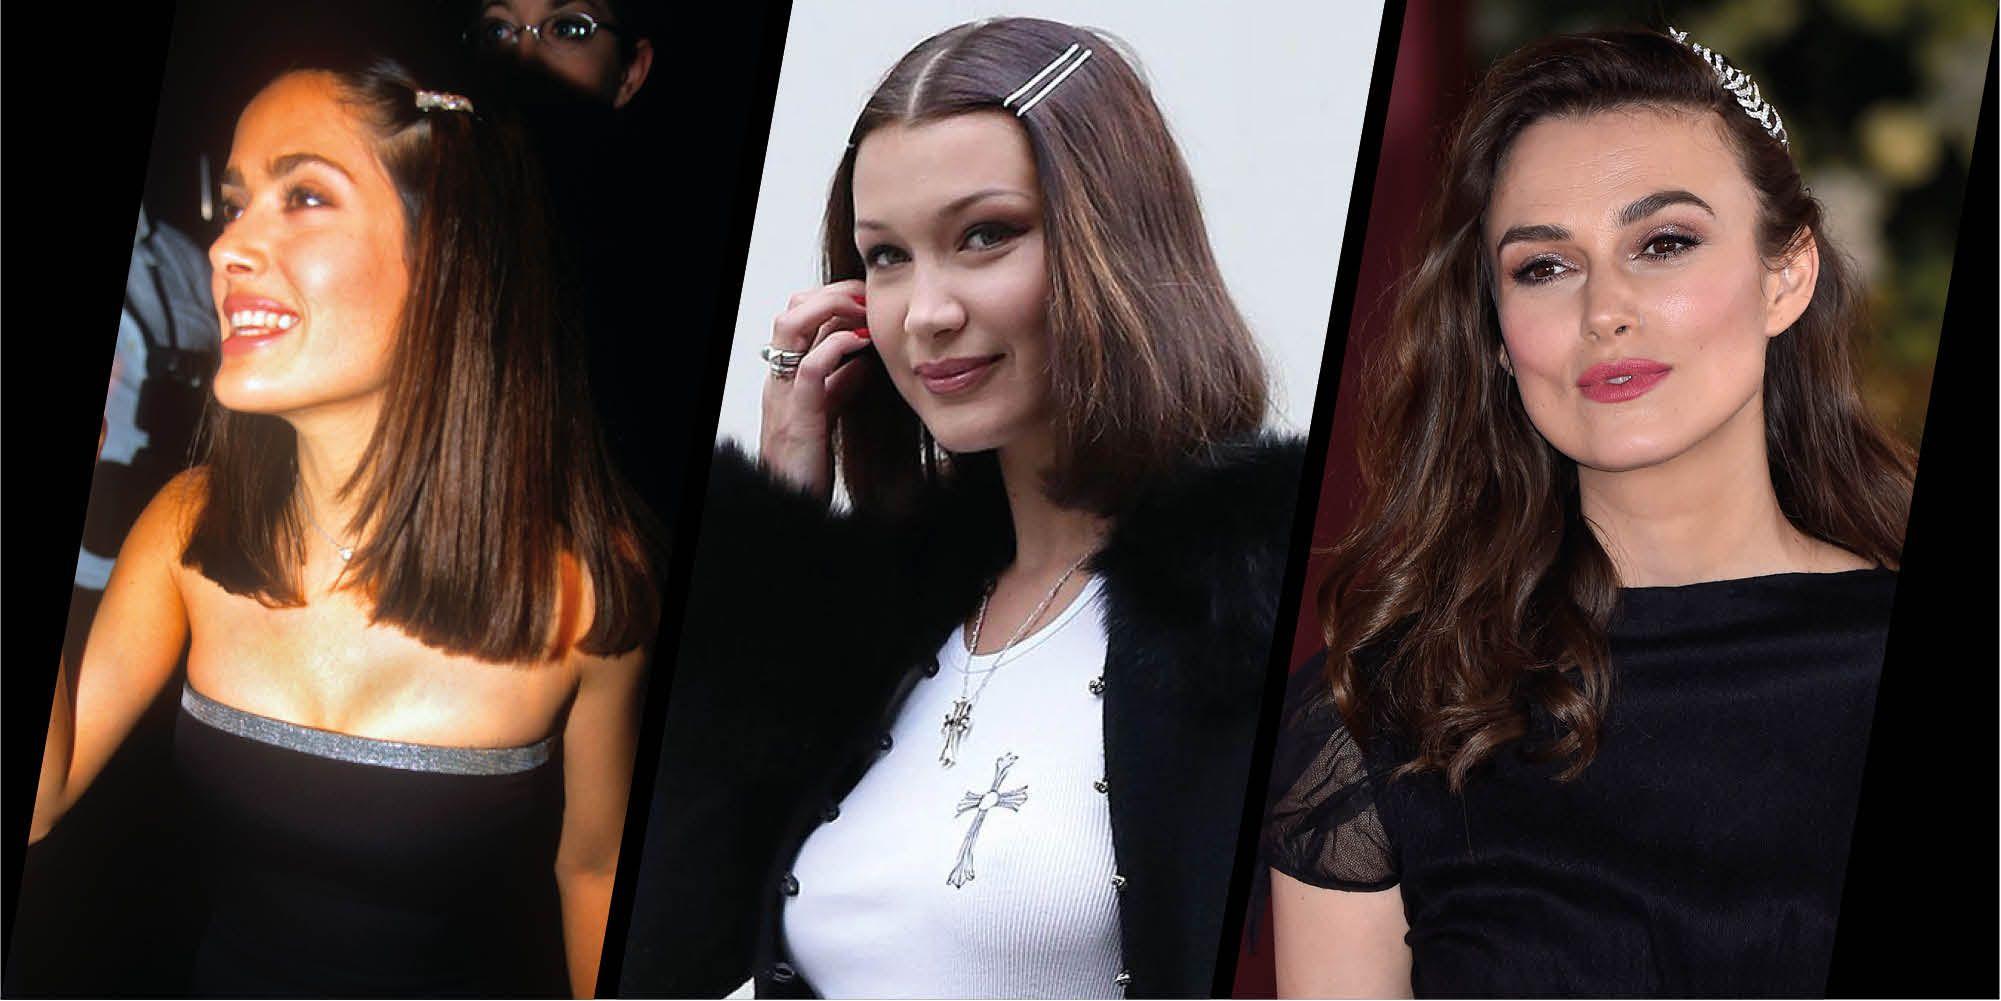 Hair clips through the ages